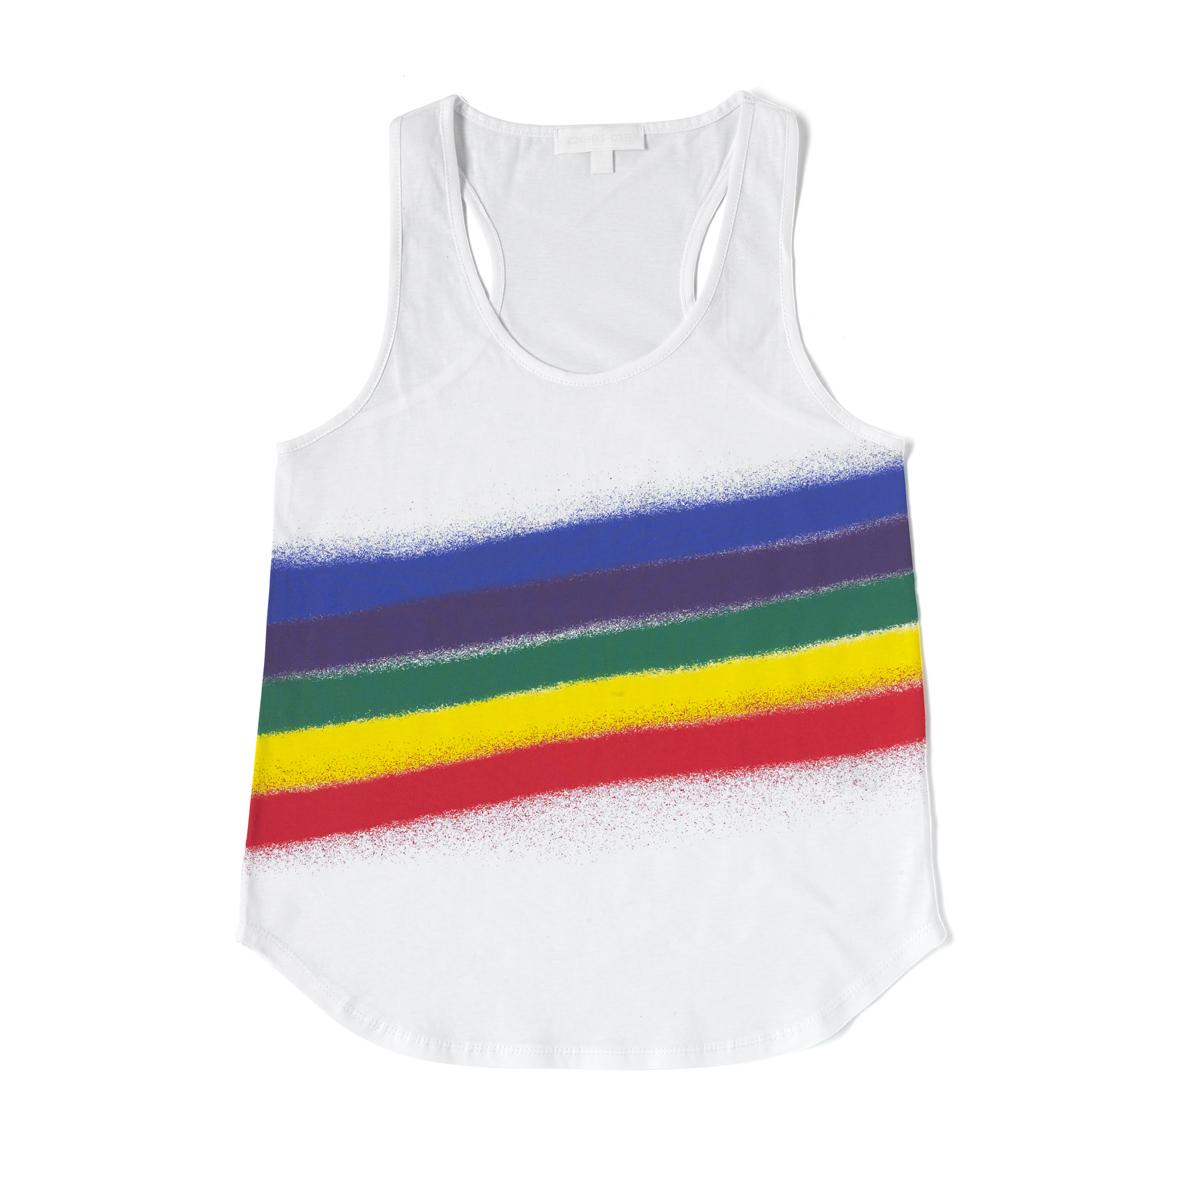 Rainbow Spray Printed Vest.